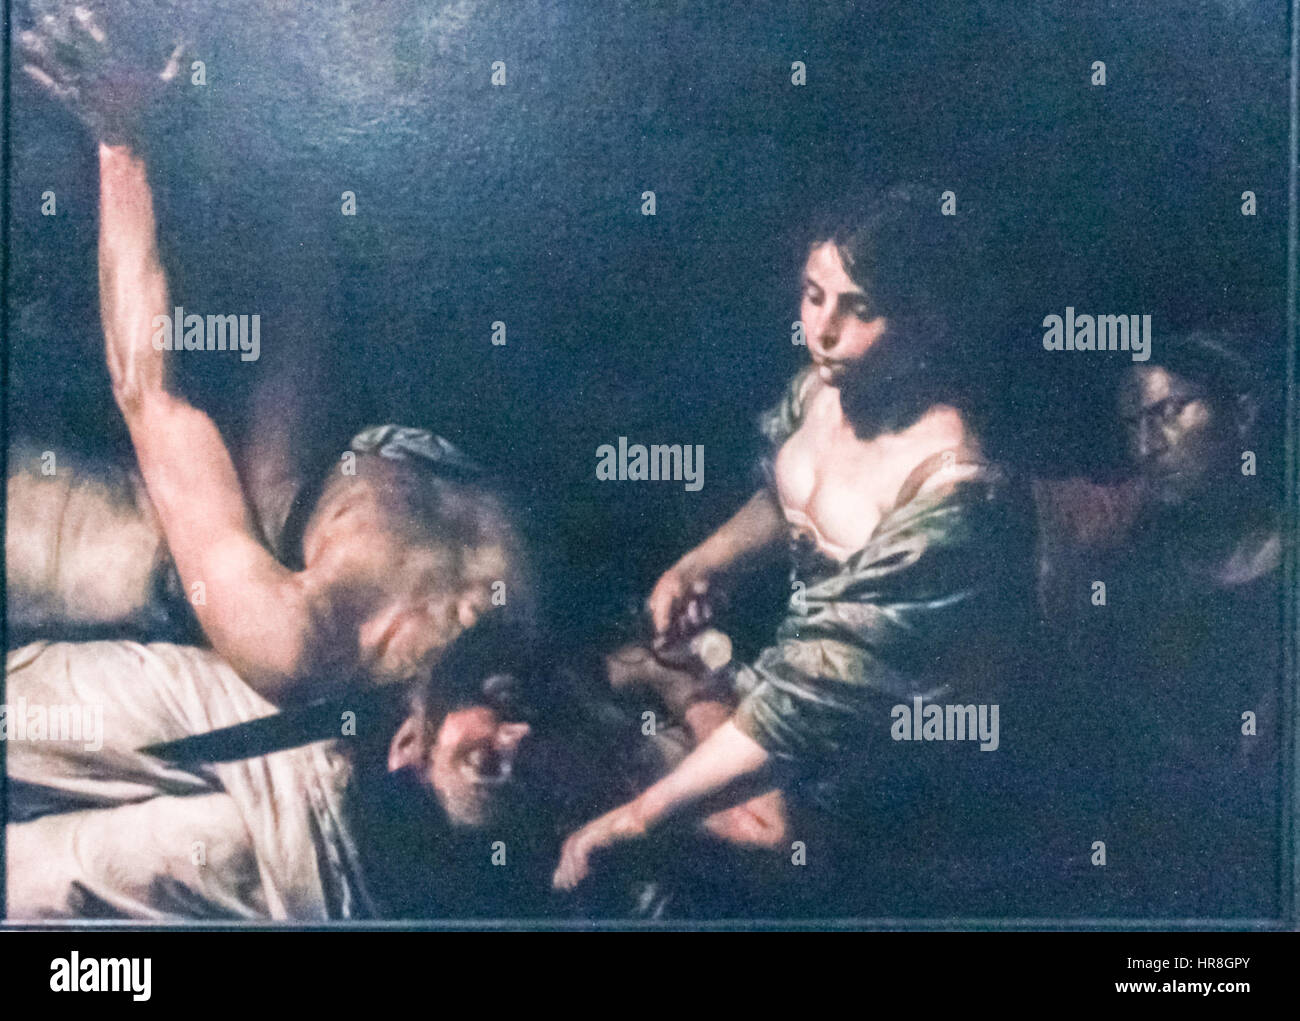 Valentin de Boulogne - Judith and Holofernes - Stock Image